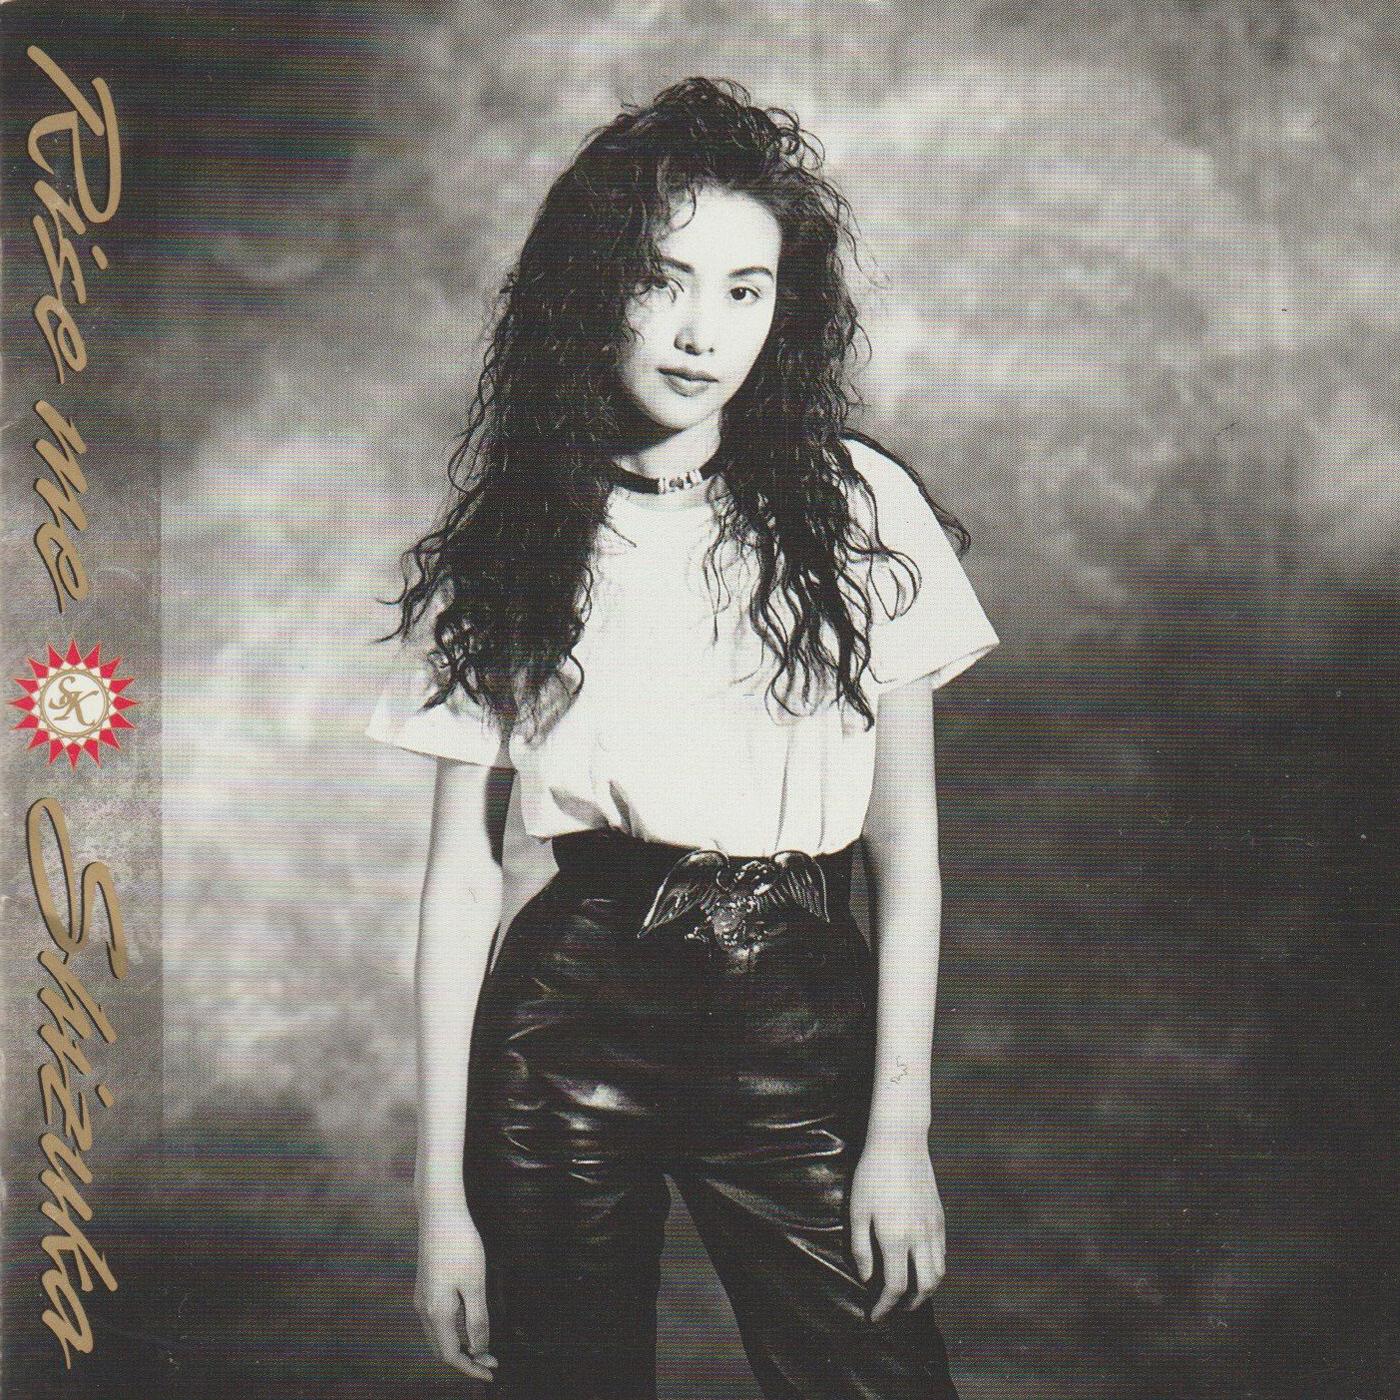 20170129.05.21 Shizuka Kudo - Rise me (1993) cover.jpg